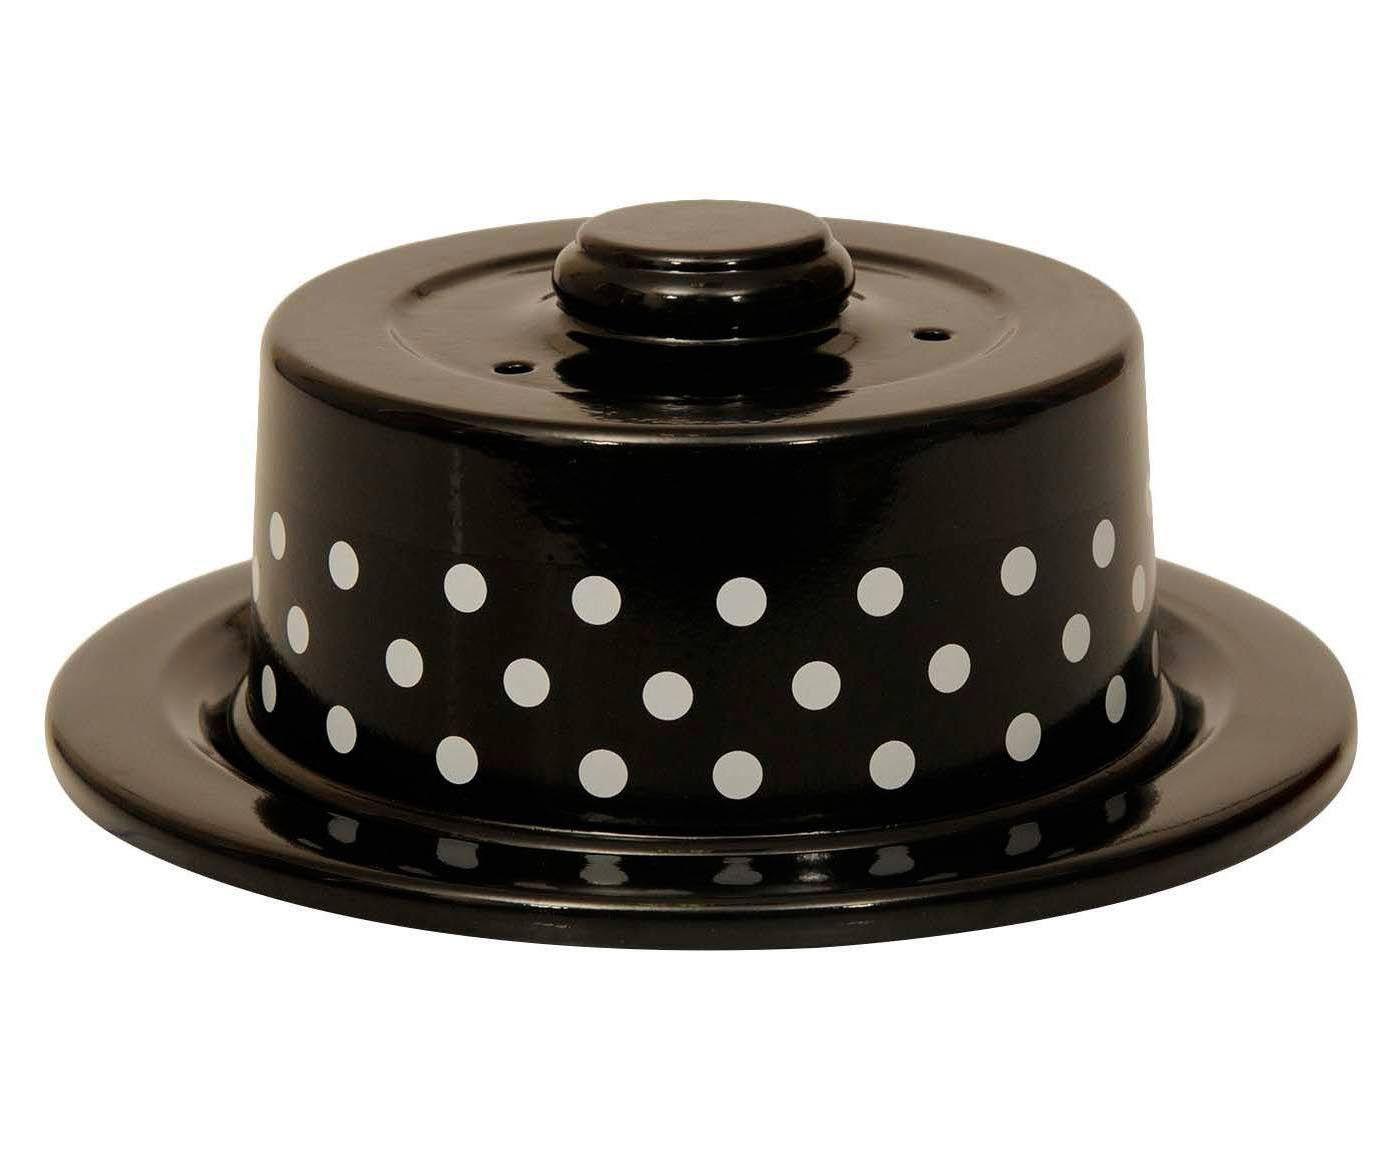 Boleira Polka Dots - Preta e Branca | Westwing.com.br